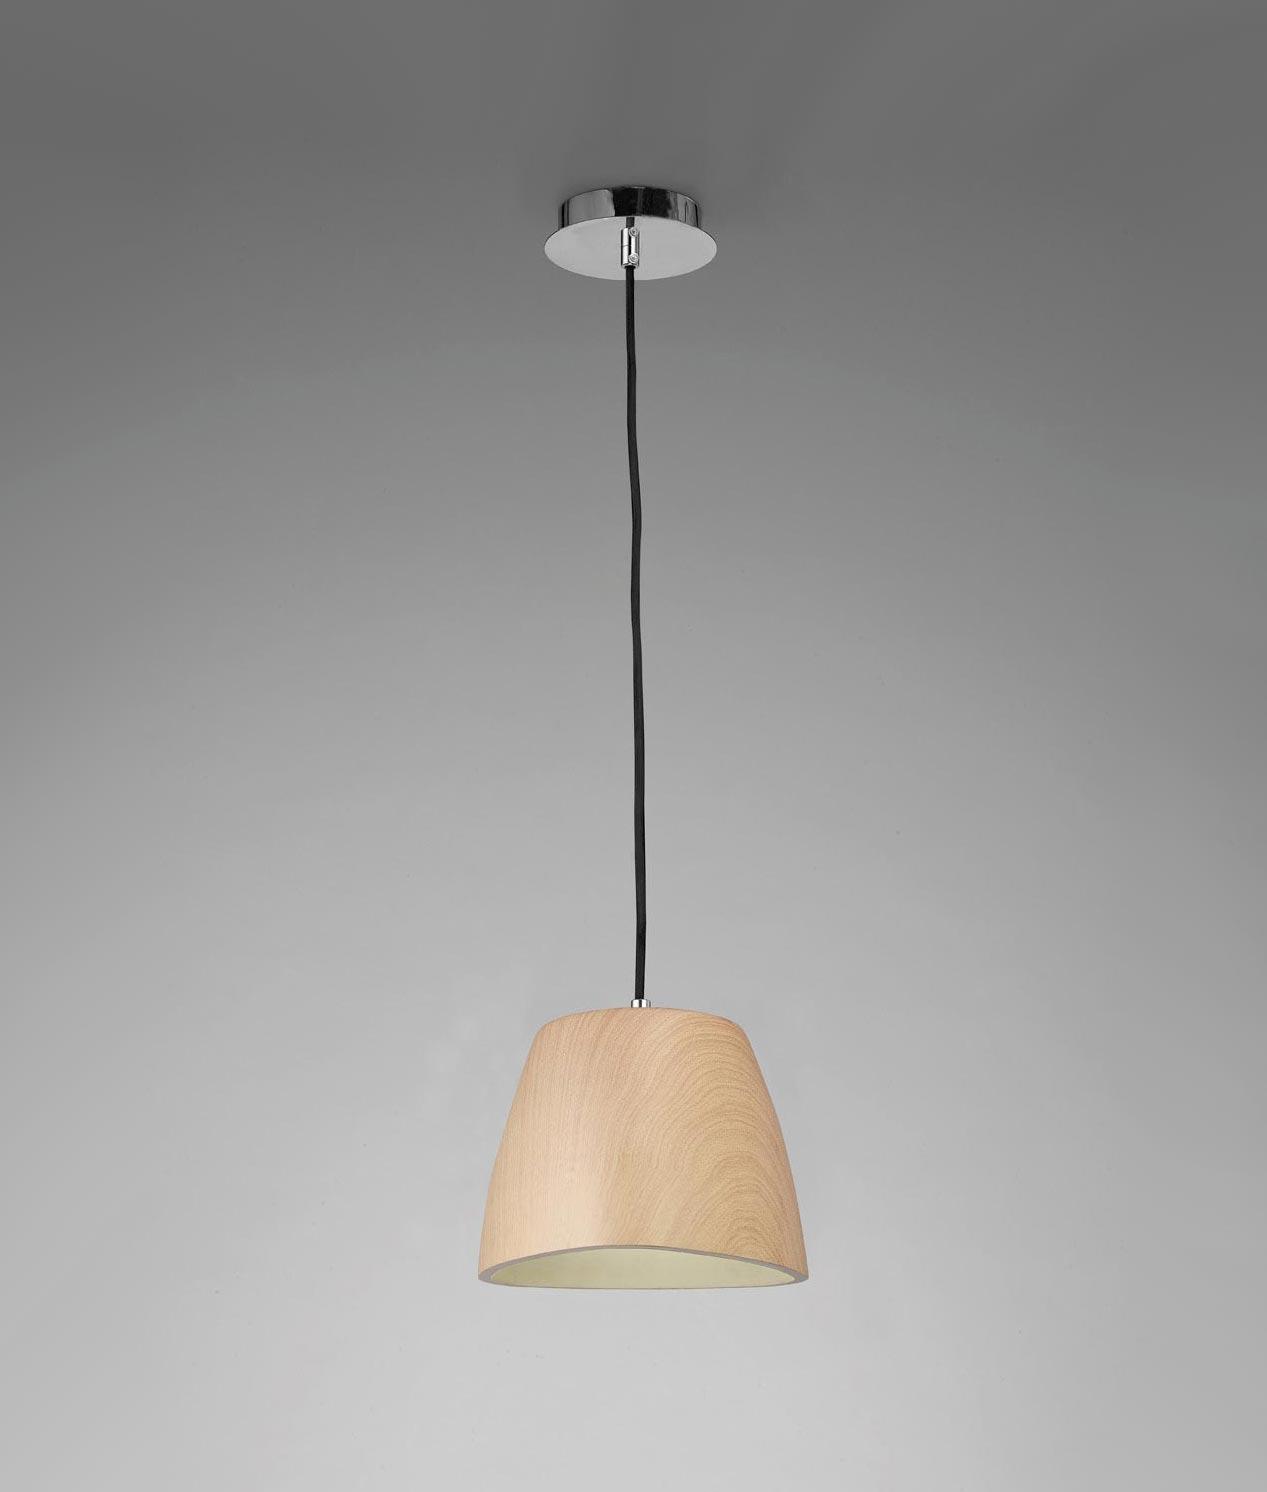 Lámpara colgante madera pequeña TRIANGLE